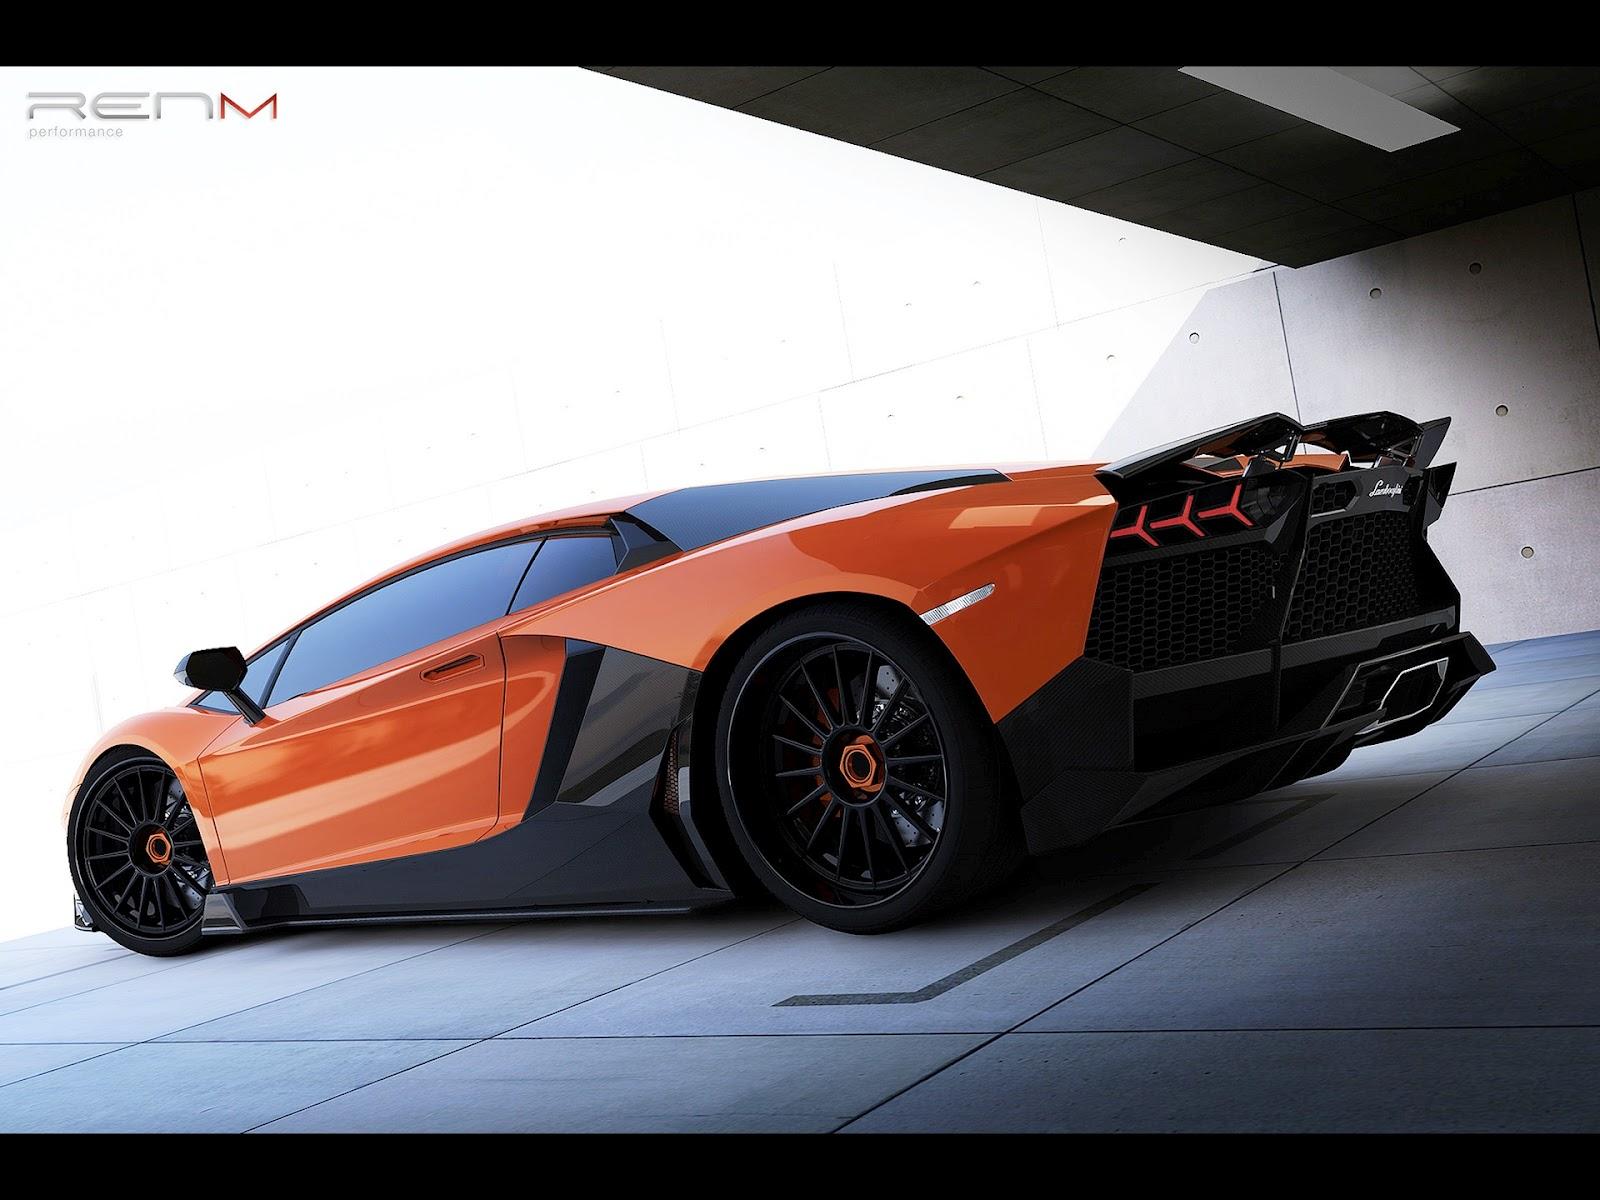 Lamborghini limited edition